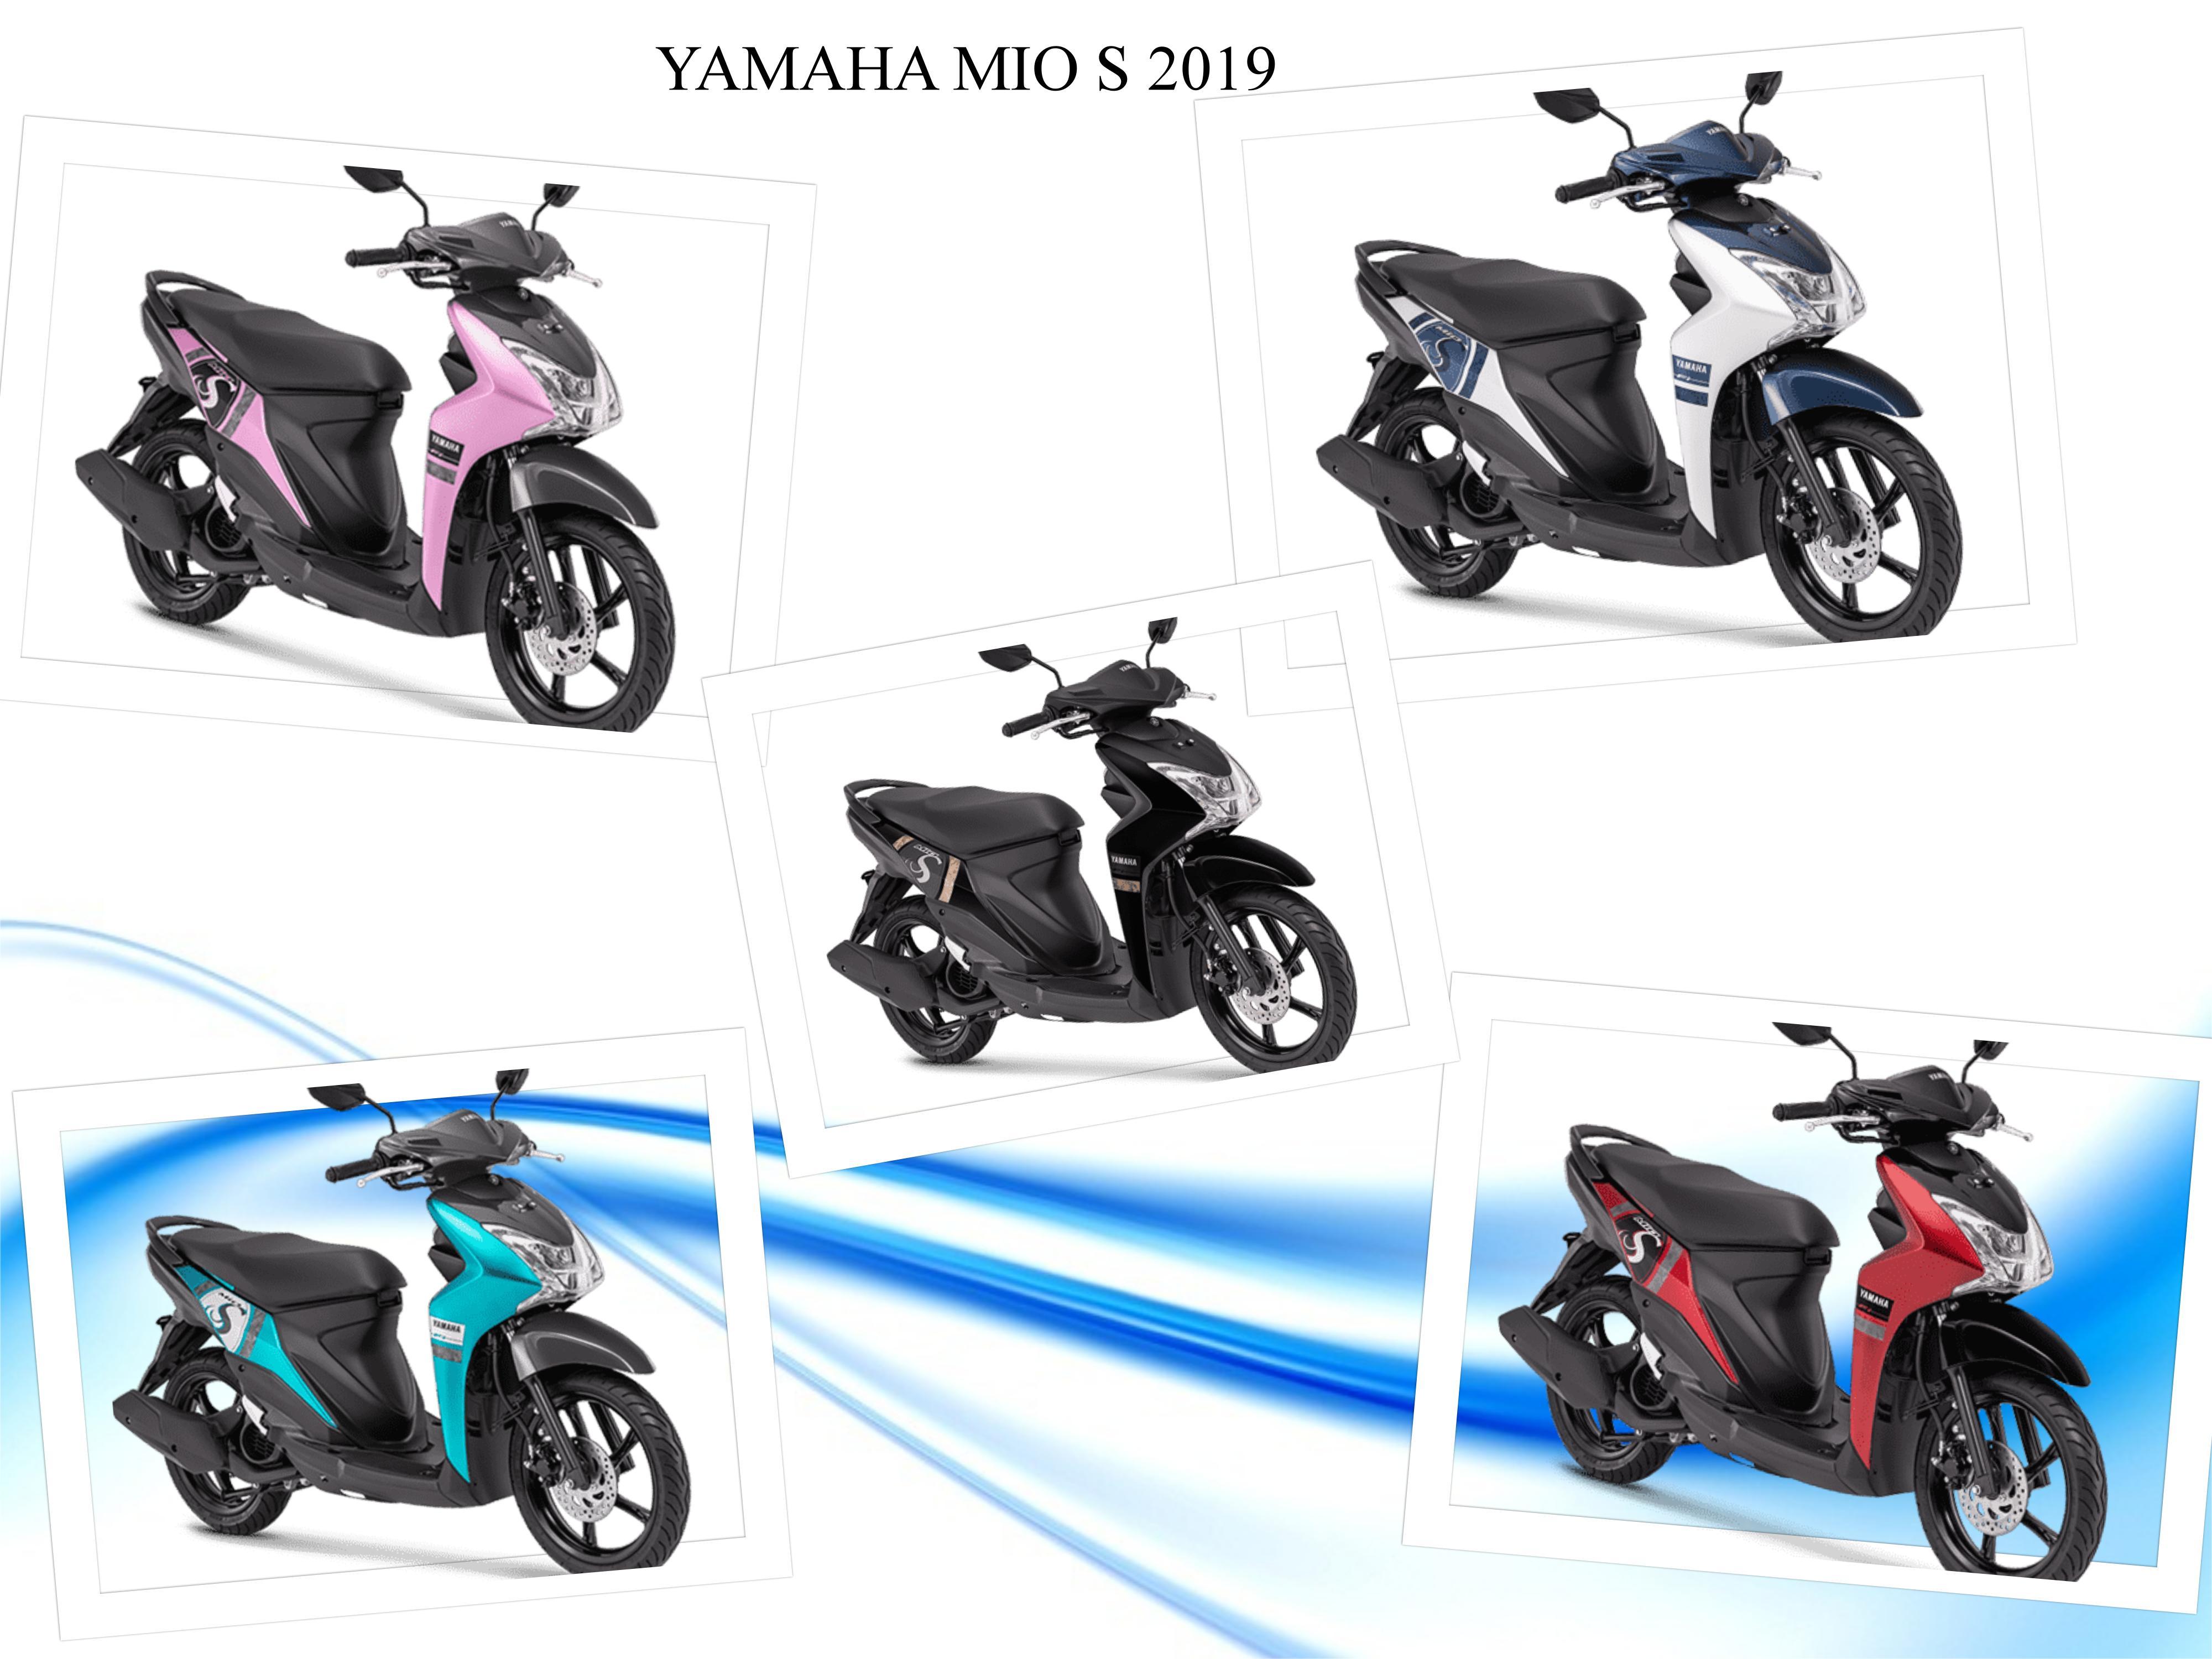 Yamaha Mio S 2019